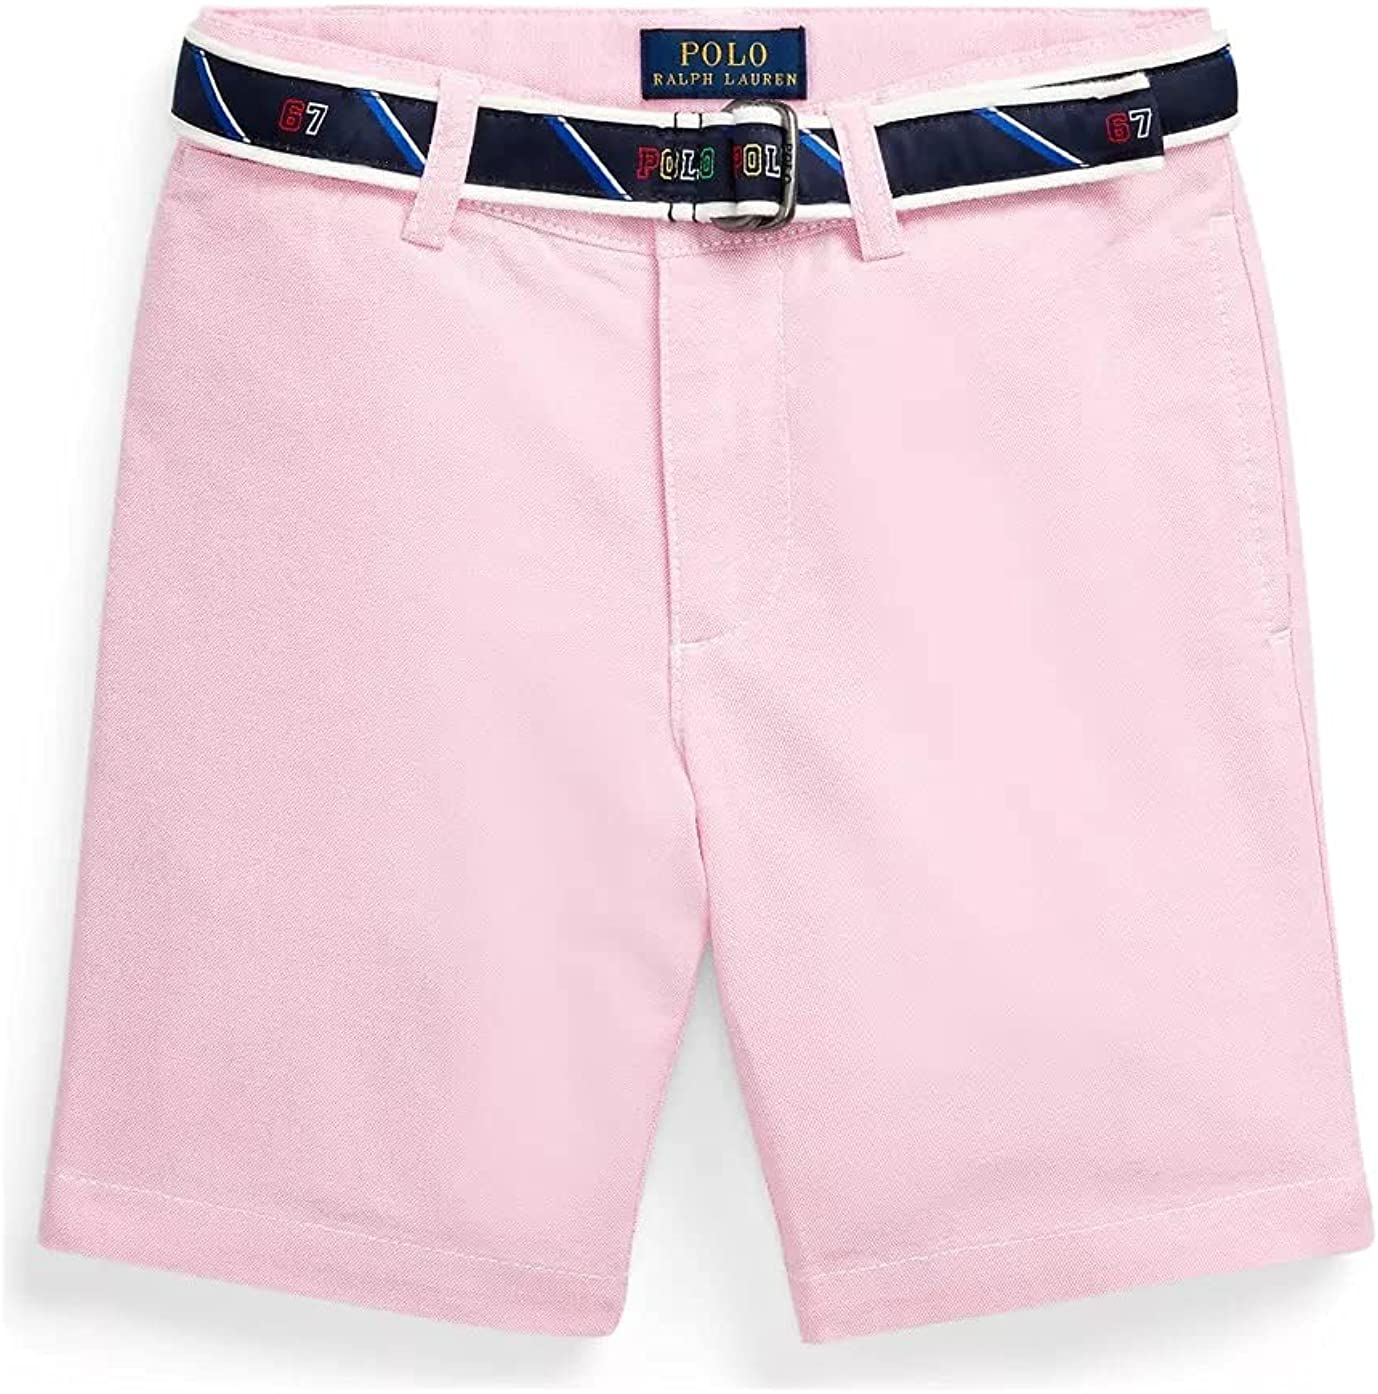 Polo Tucson Mall Popular overseas Ralph Lauren Boys Short Oxford Belt